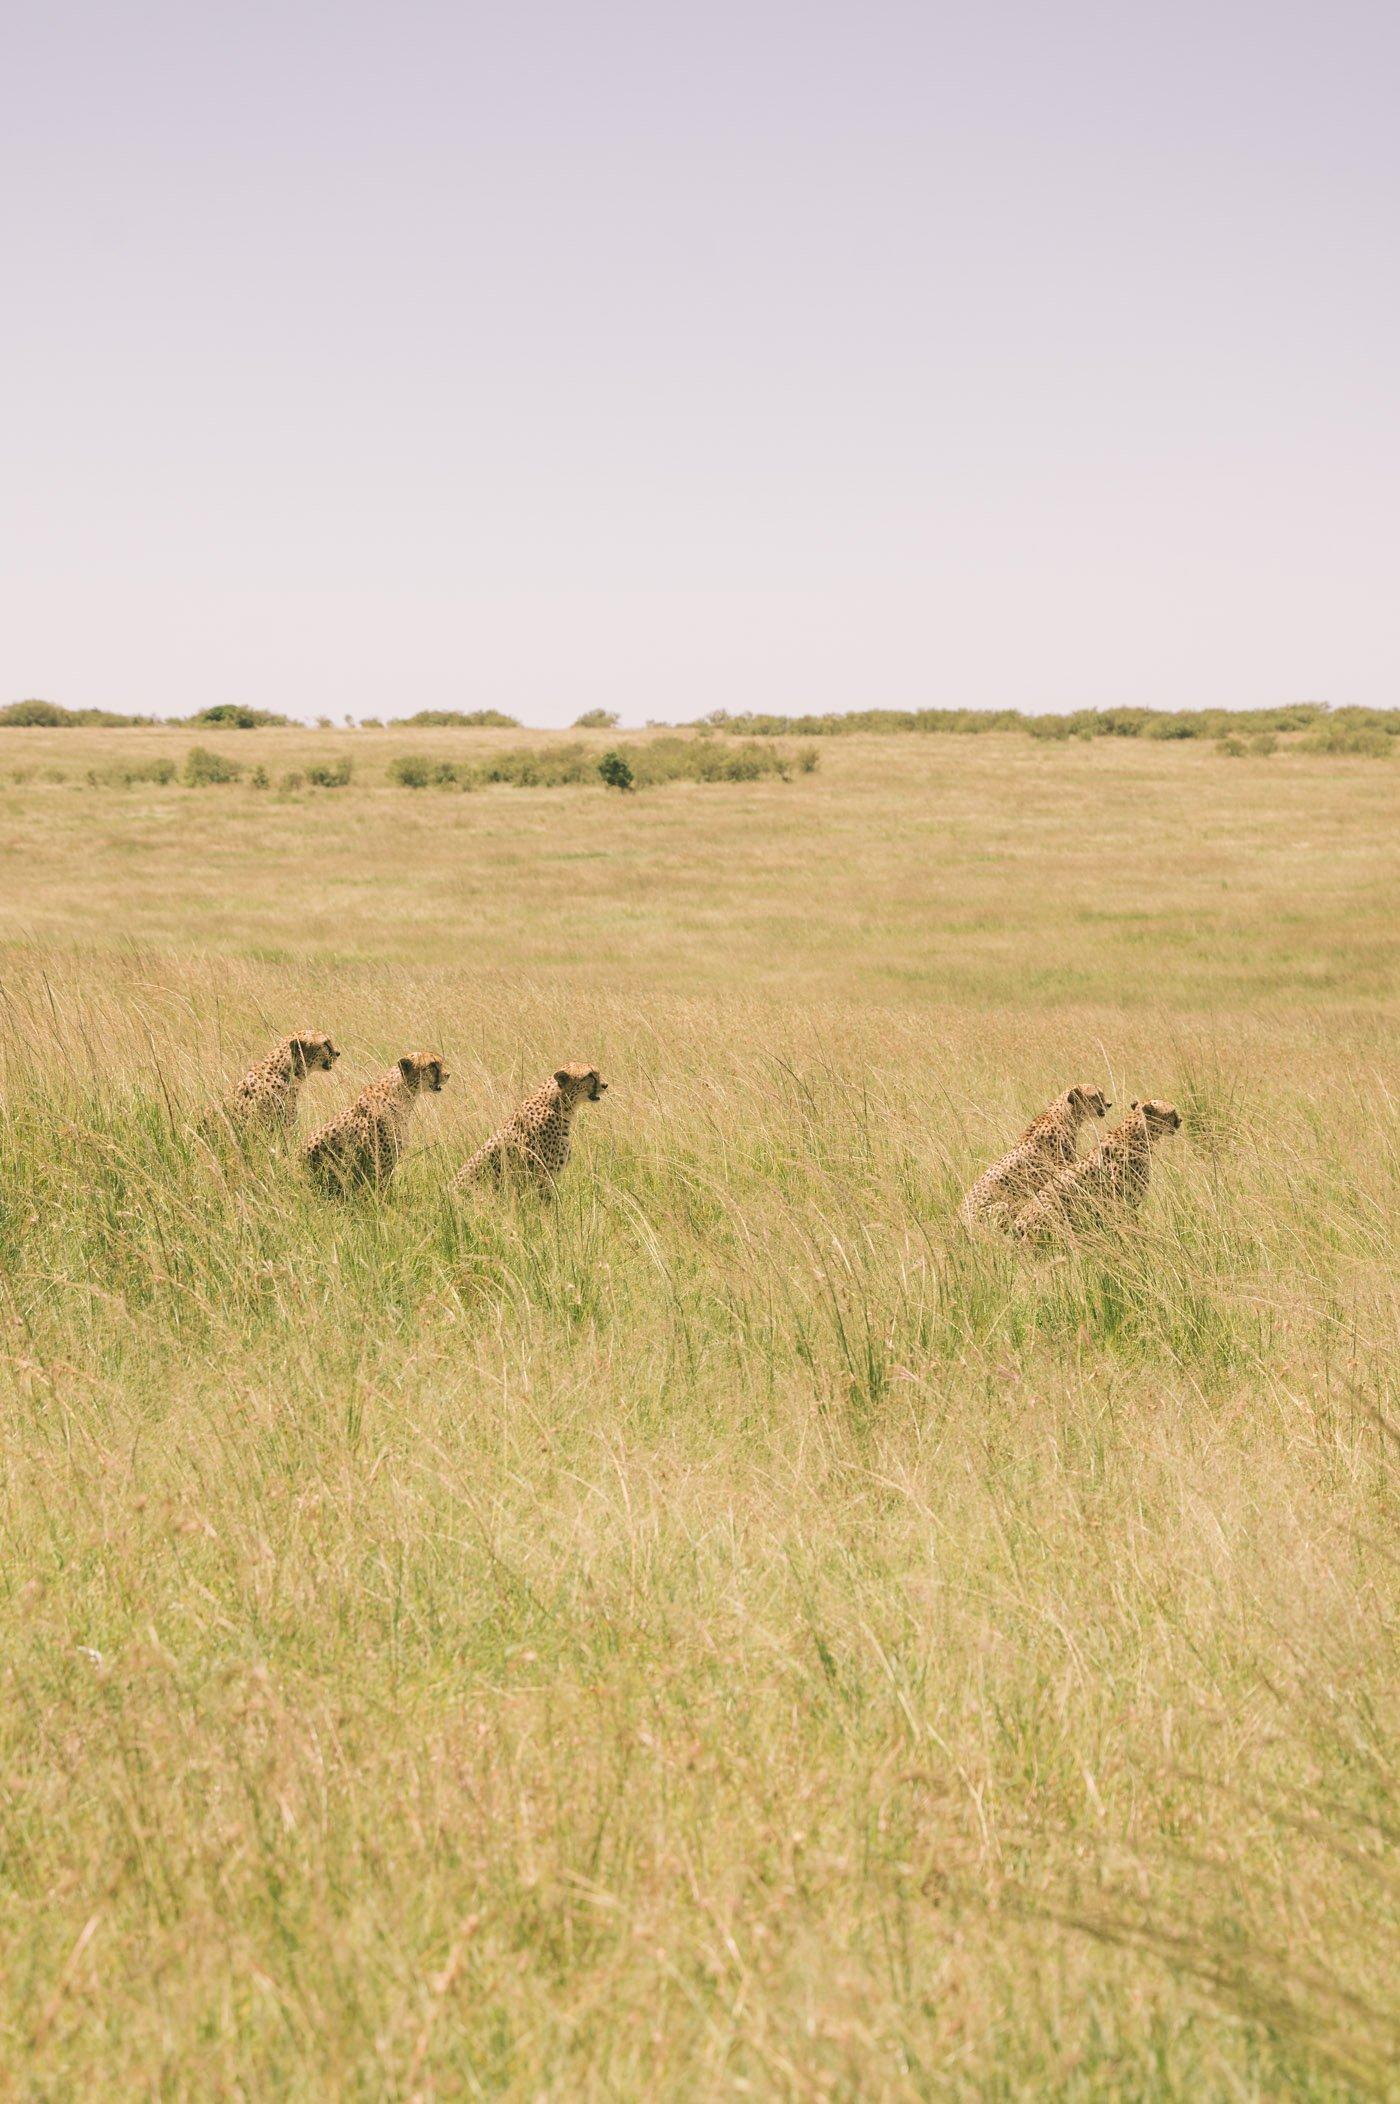 Coalition of five cheetah brothers in the Maasai Mara Kenya